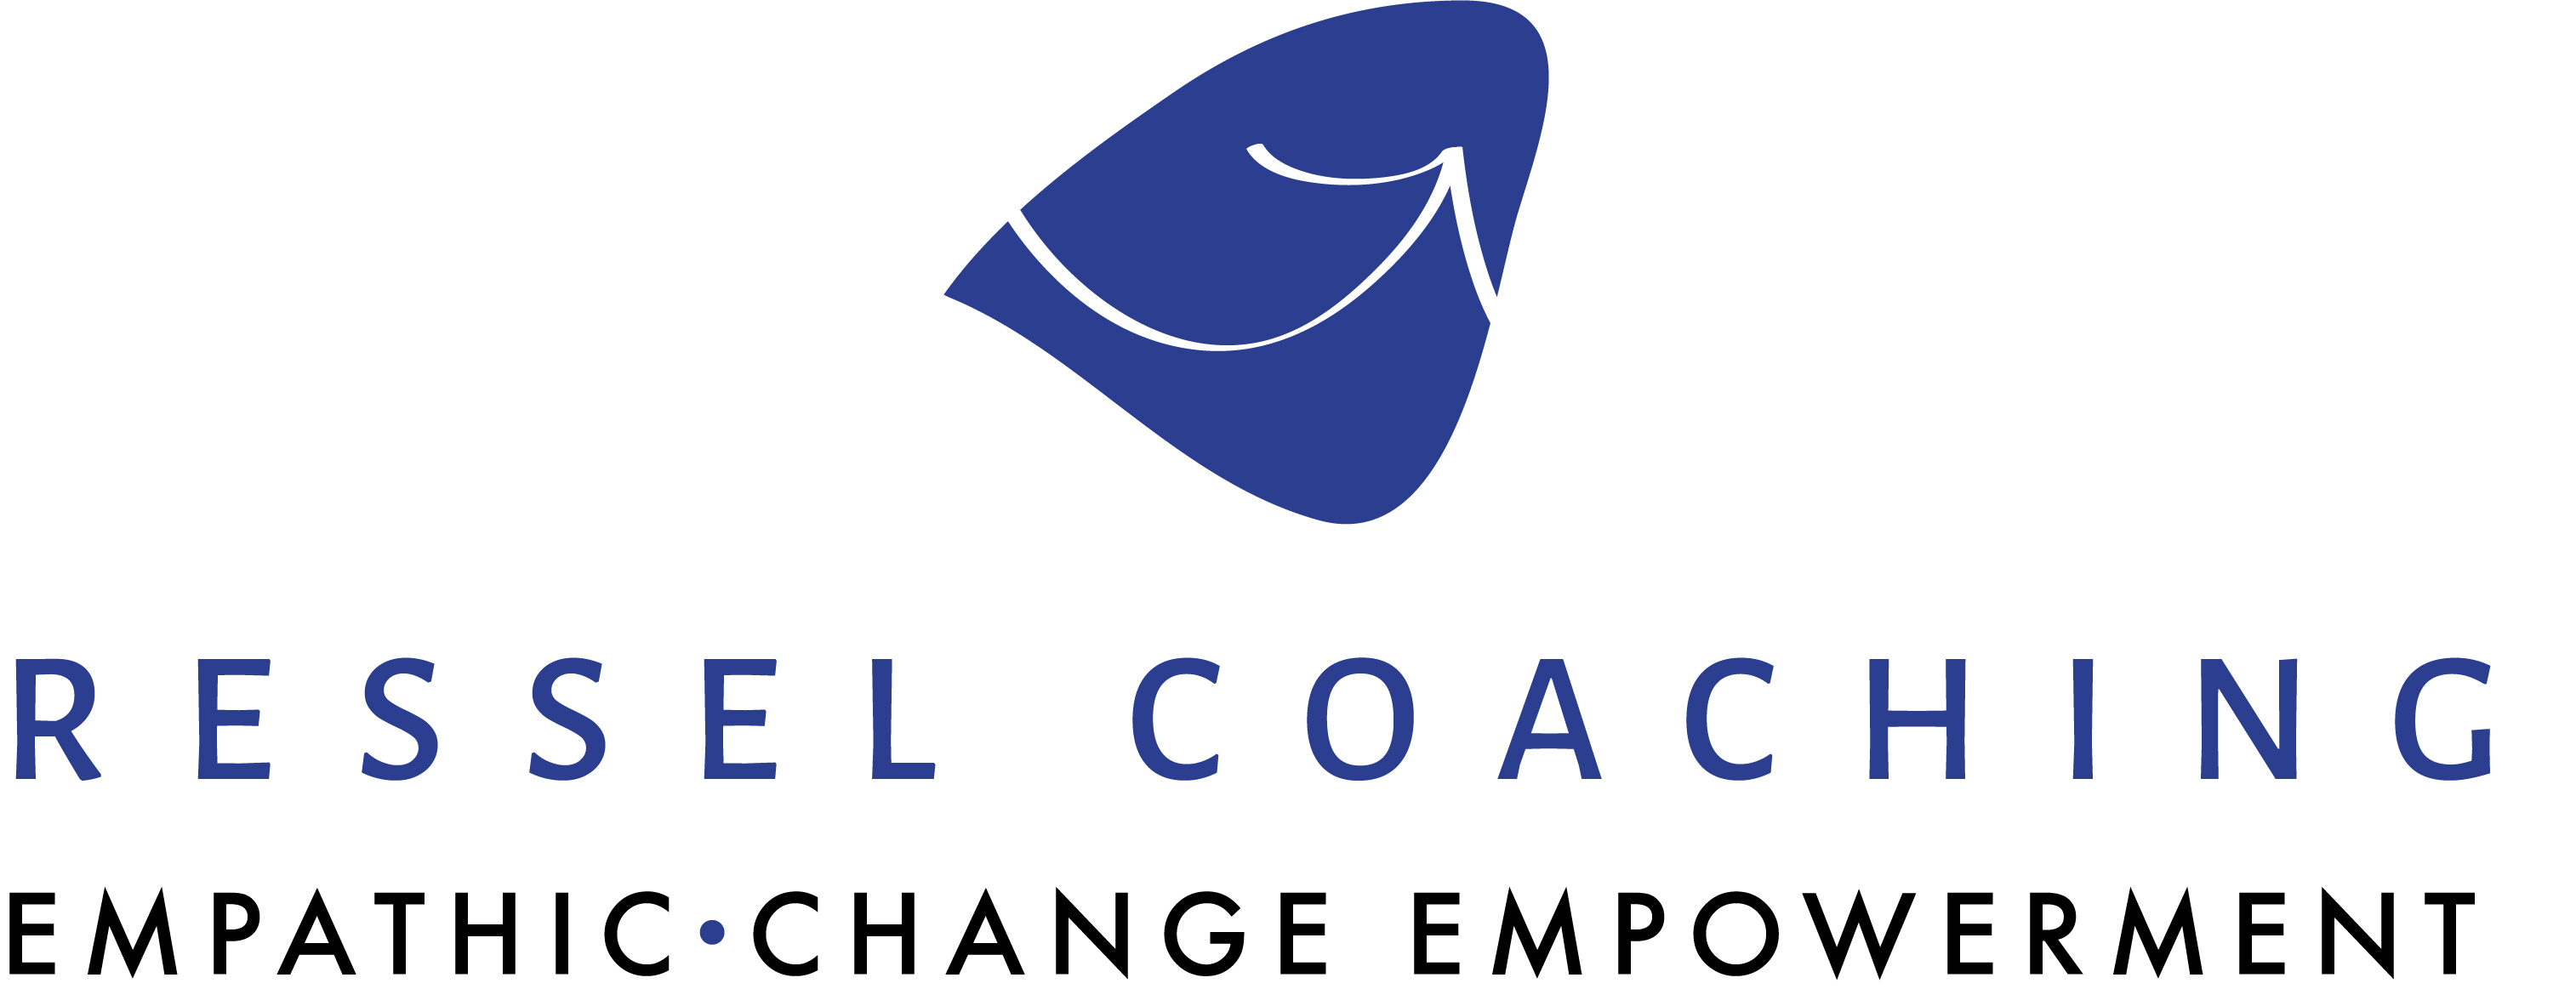 Ressel Coaching